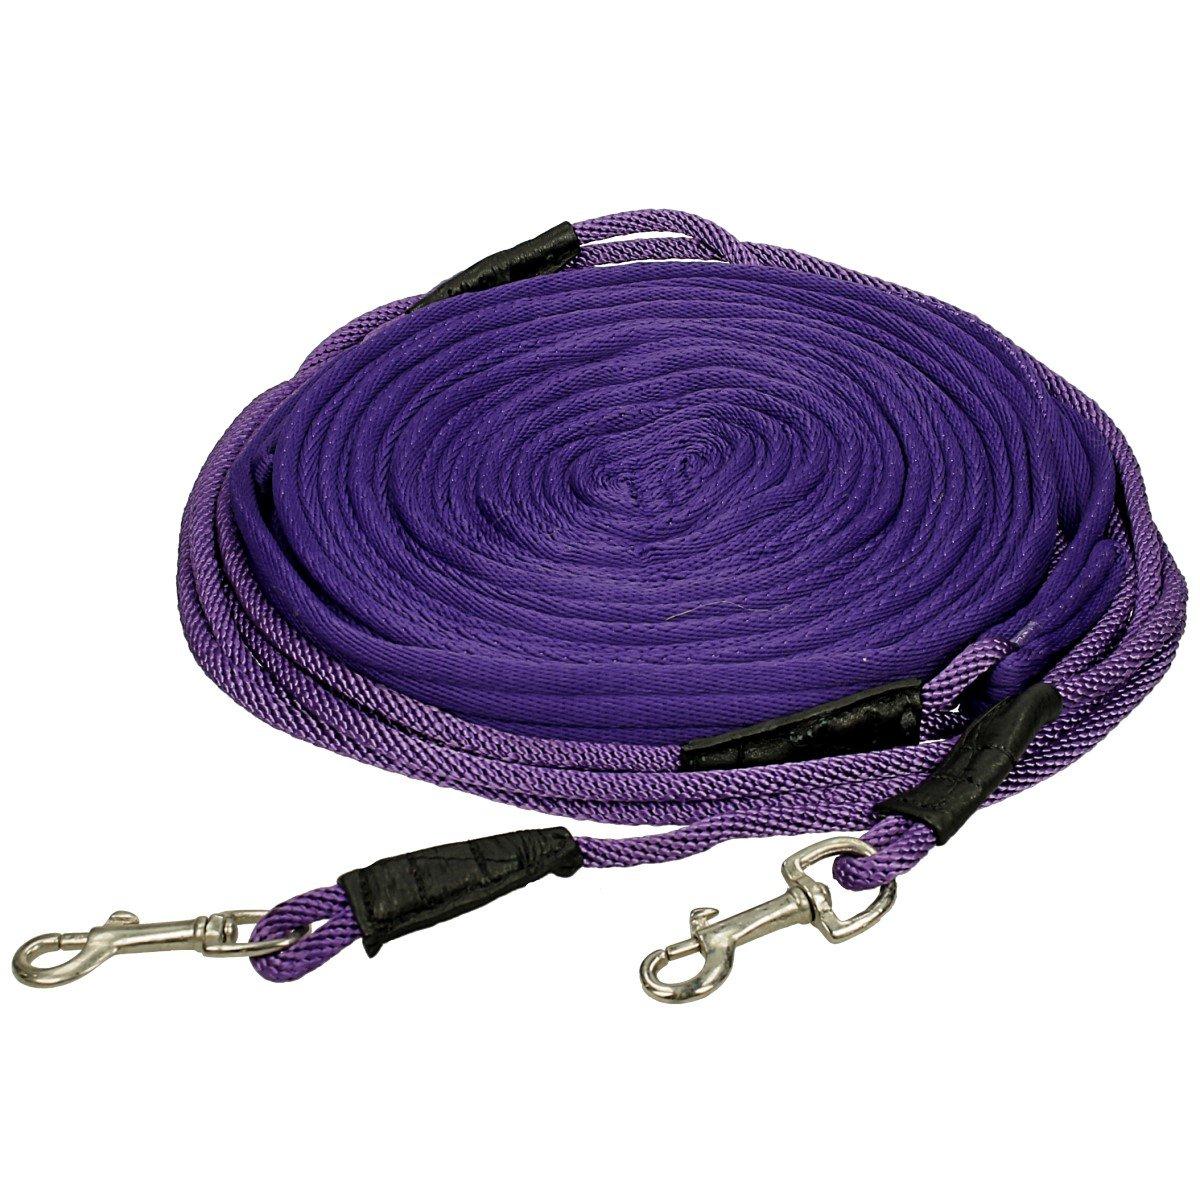 Epplejeck Doppellonge Weich - Violett - Gr. Full